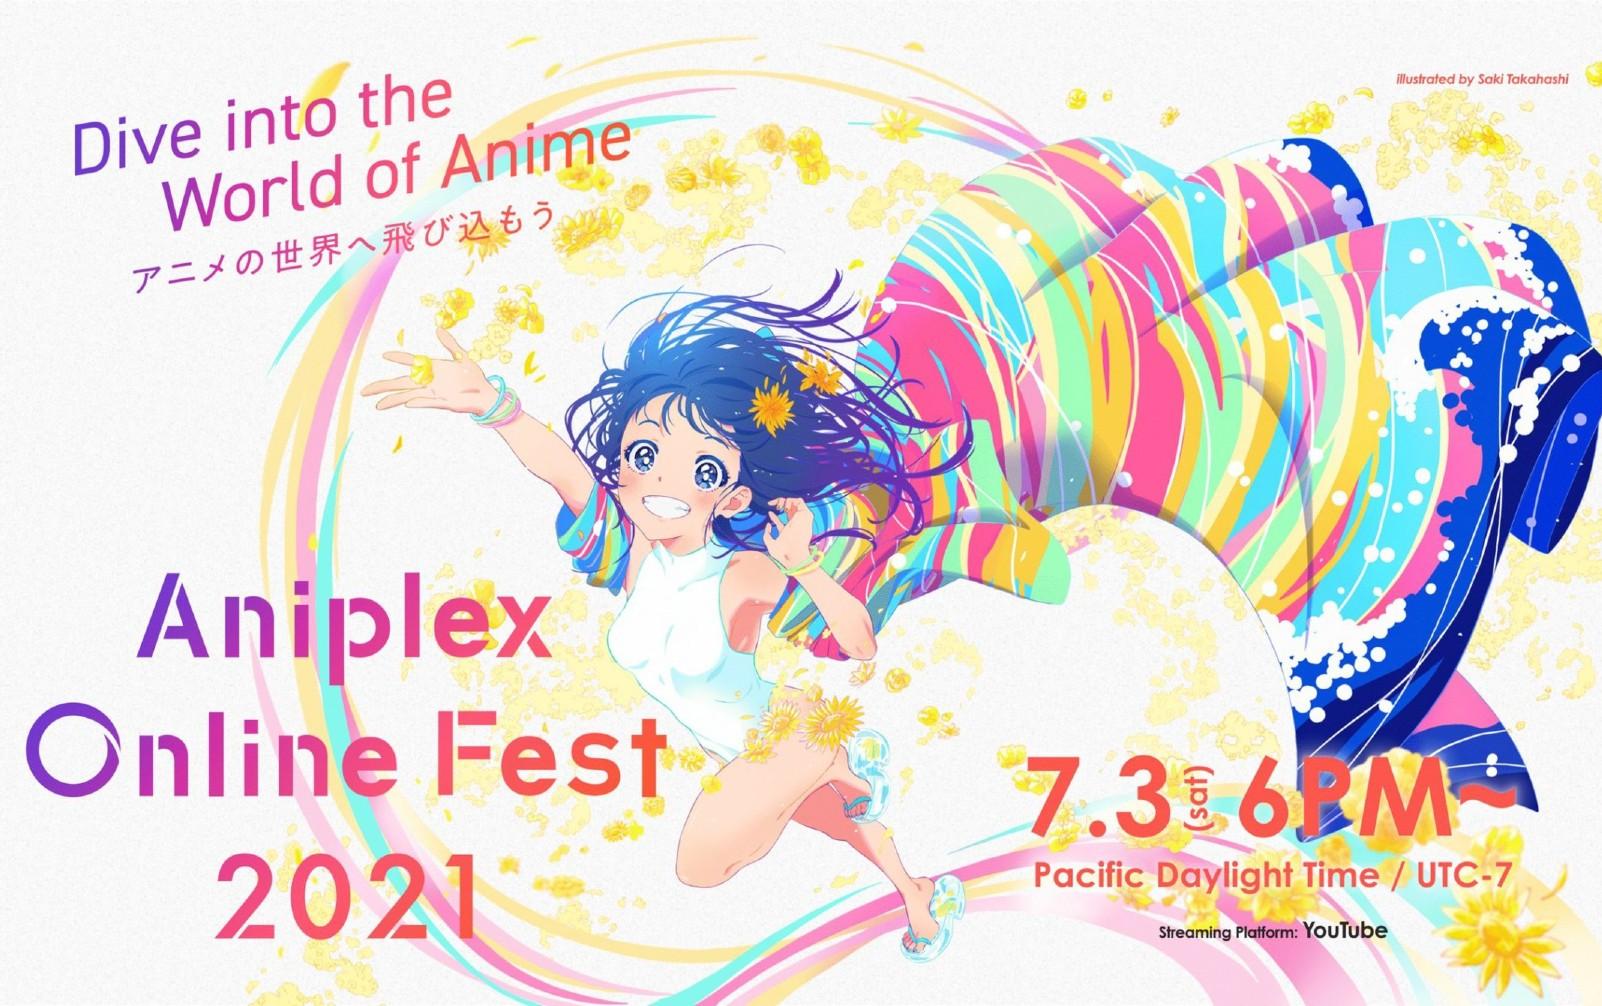 Aniplex Online Fest 2021 tendrá a Aimer, ClariS, LiSA, ReoNa, y Hiroyuki Sawano